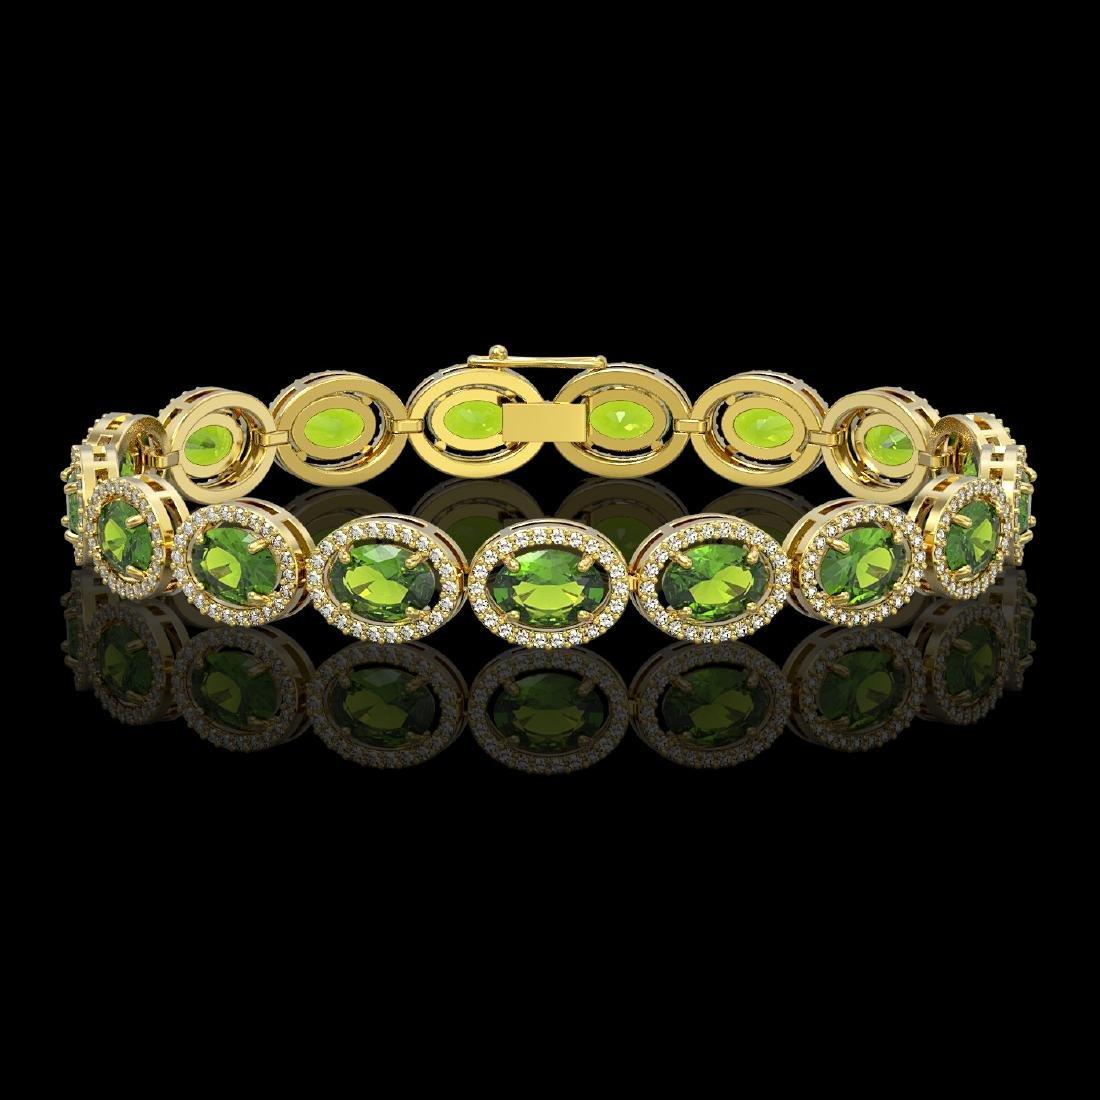 21.13 CTW Peridot & Diamond Halo Bracelet 10K Yellow